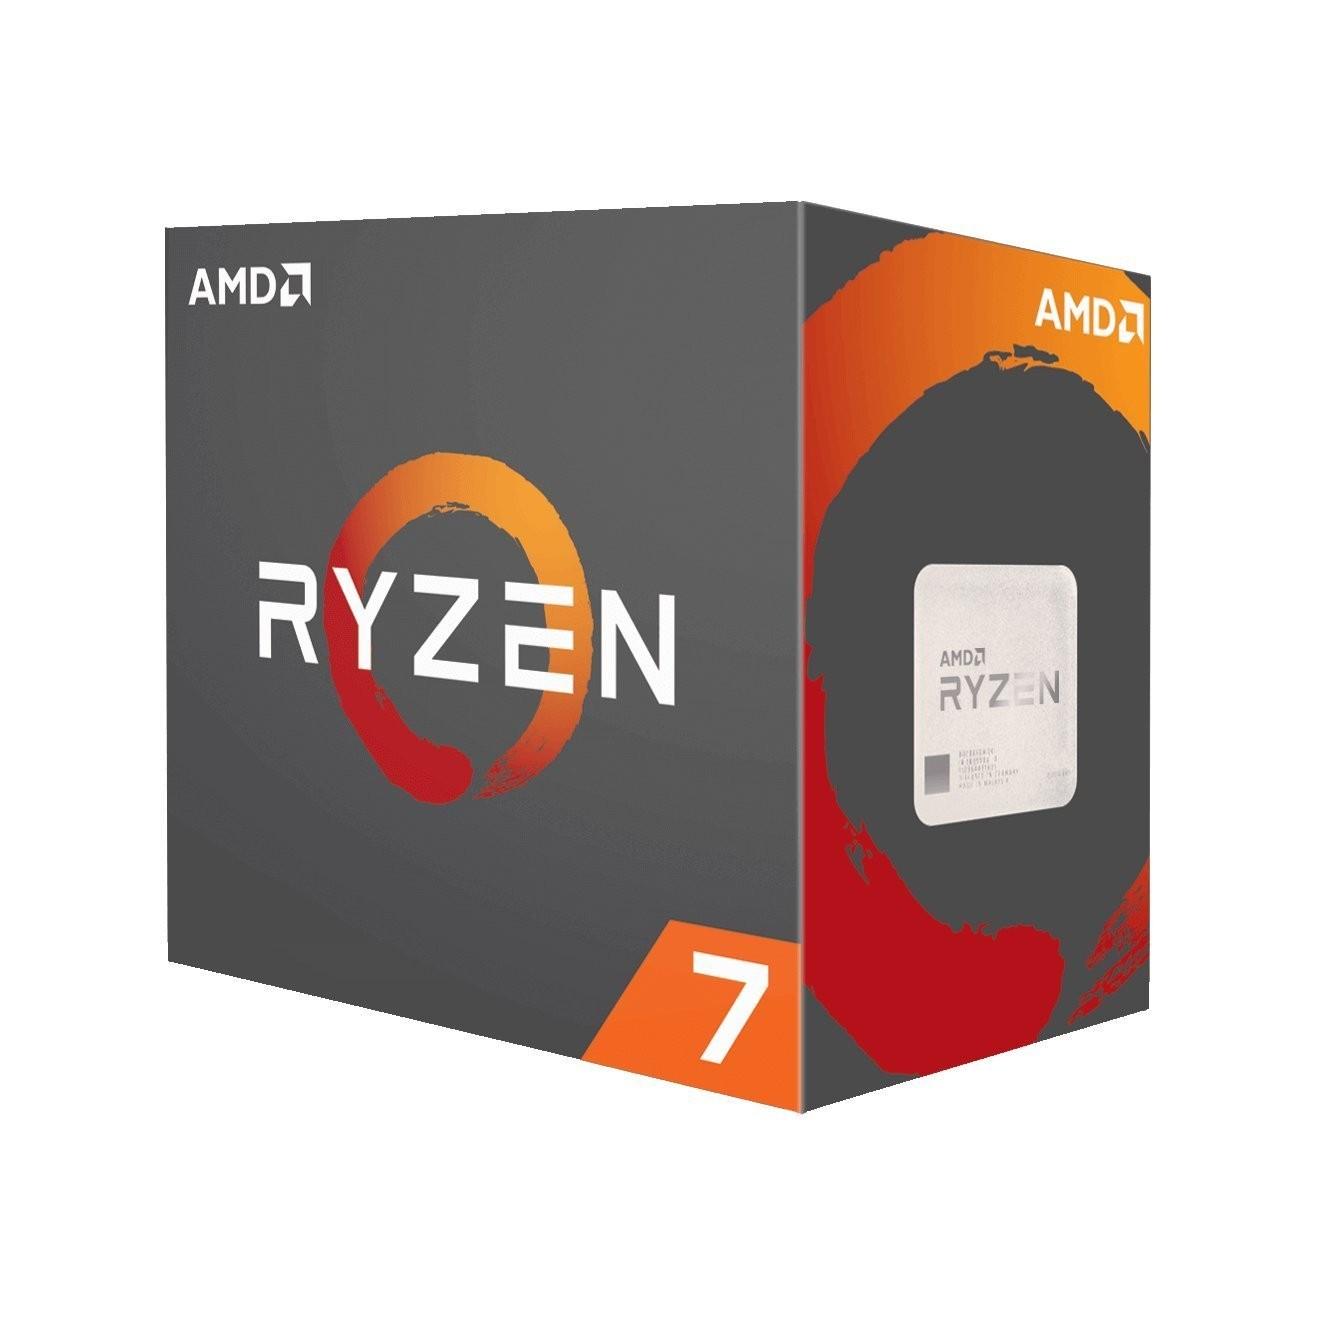 CPU AMD Ryzen 7 1800X 8core (3,6GHz) bez chladiče